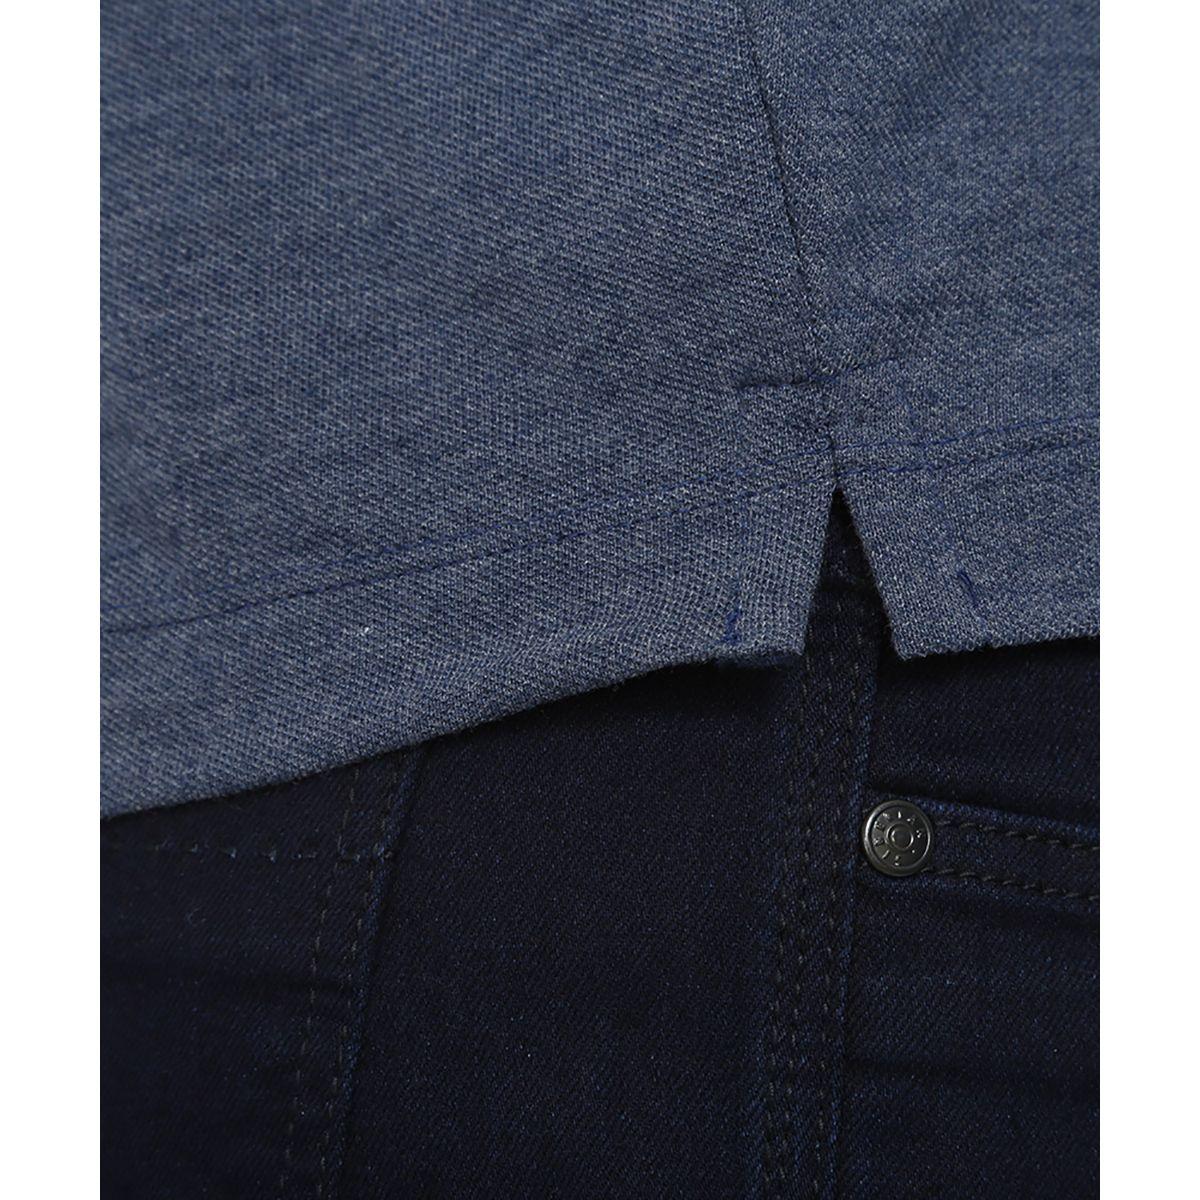 Polo-Lisa-De-Ziper-Gola-1-Listra-No-Tom-Azul-